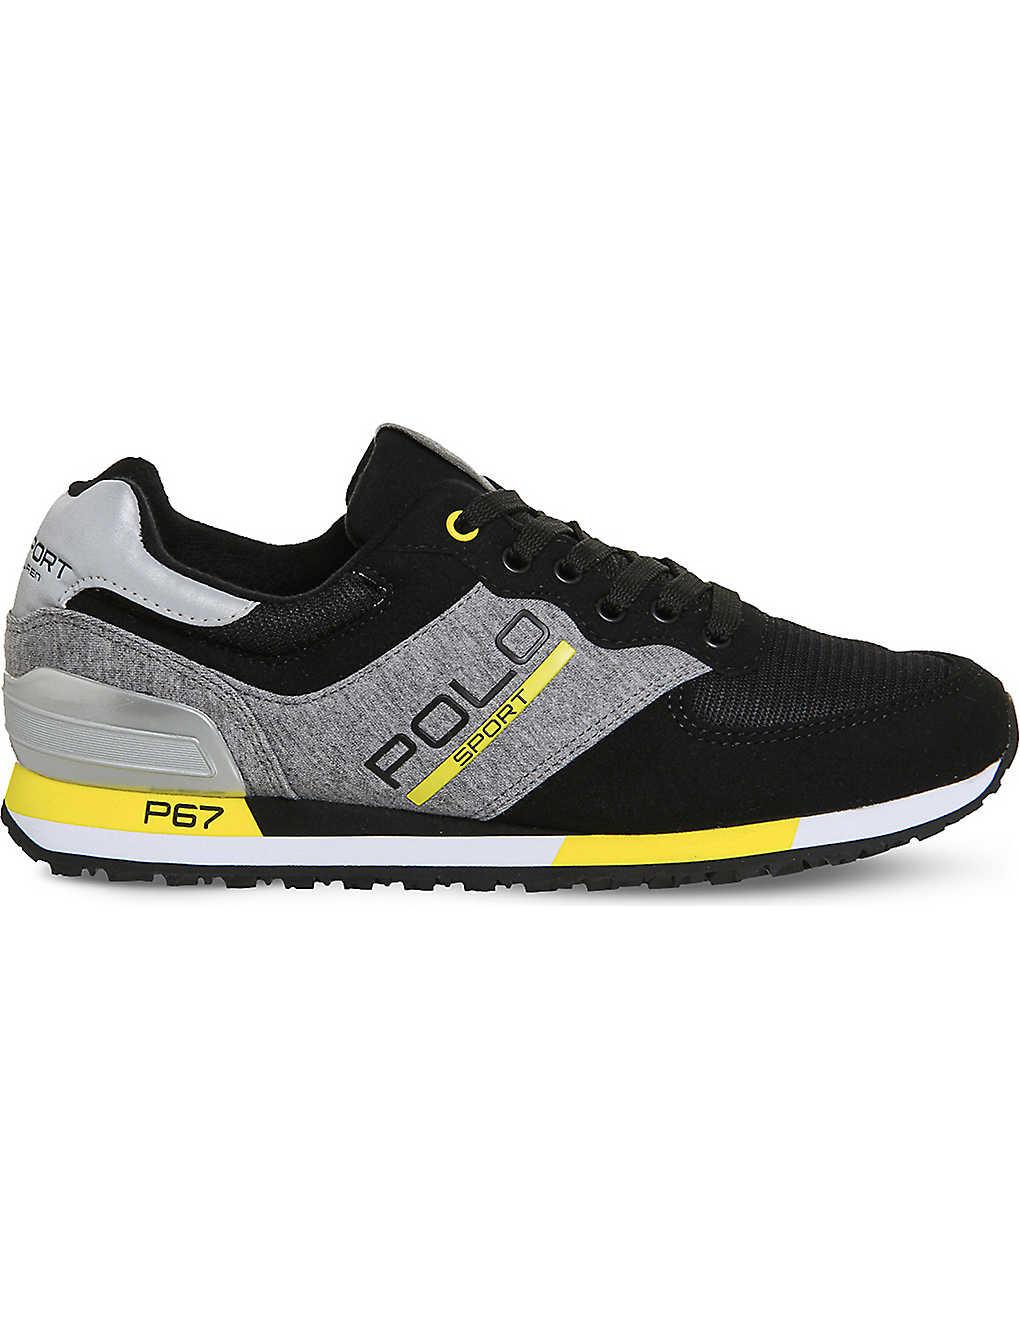 POLO RALPH LAUREN - Slaton jersey sneakers  c0c89c4ebf9